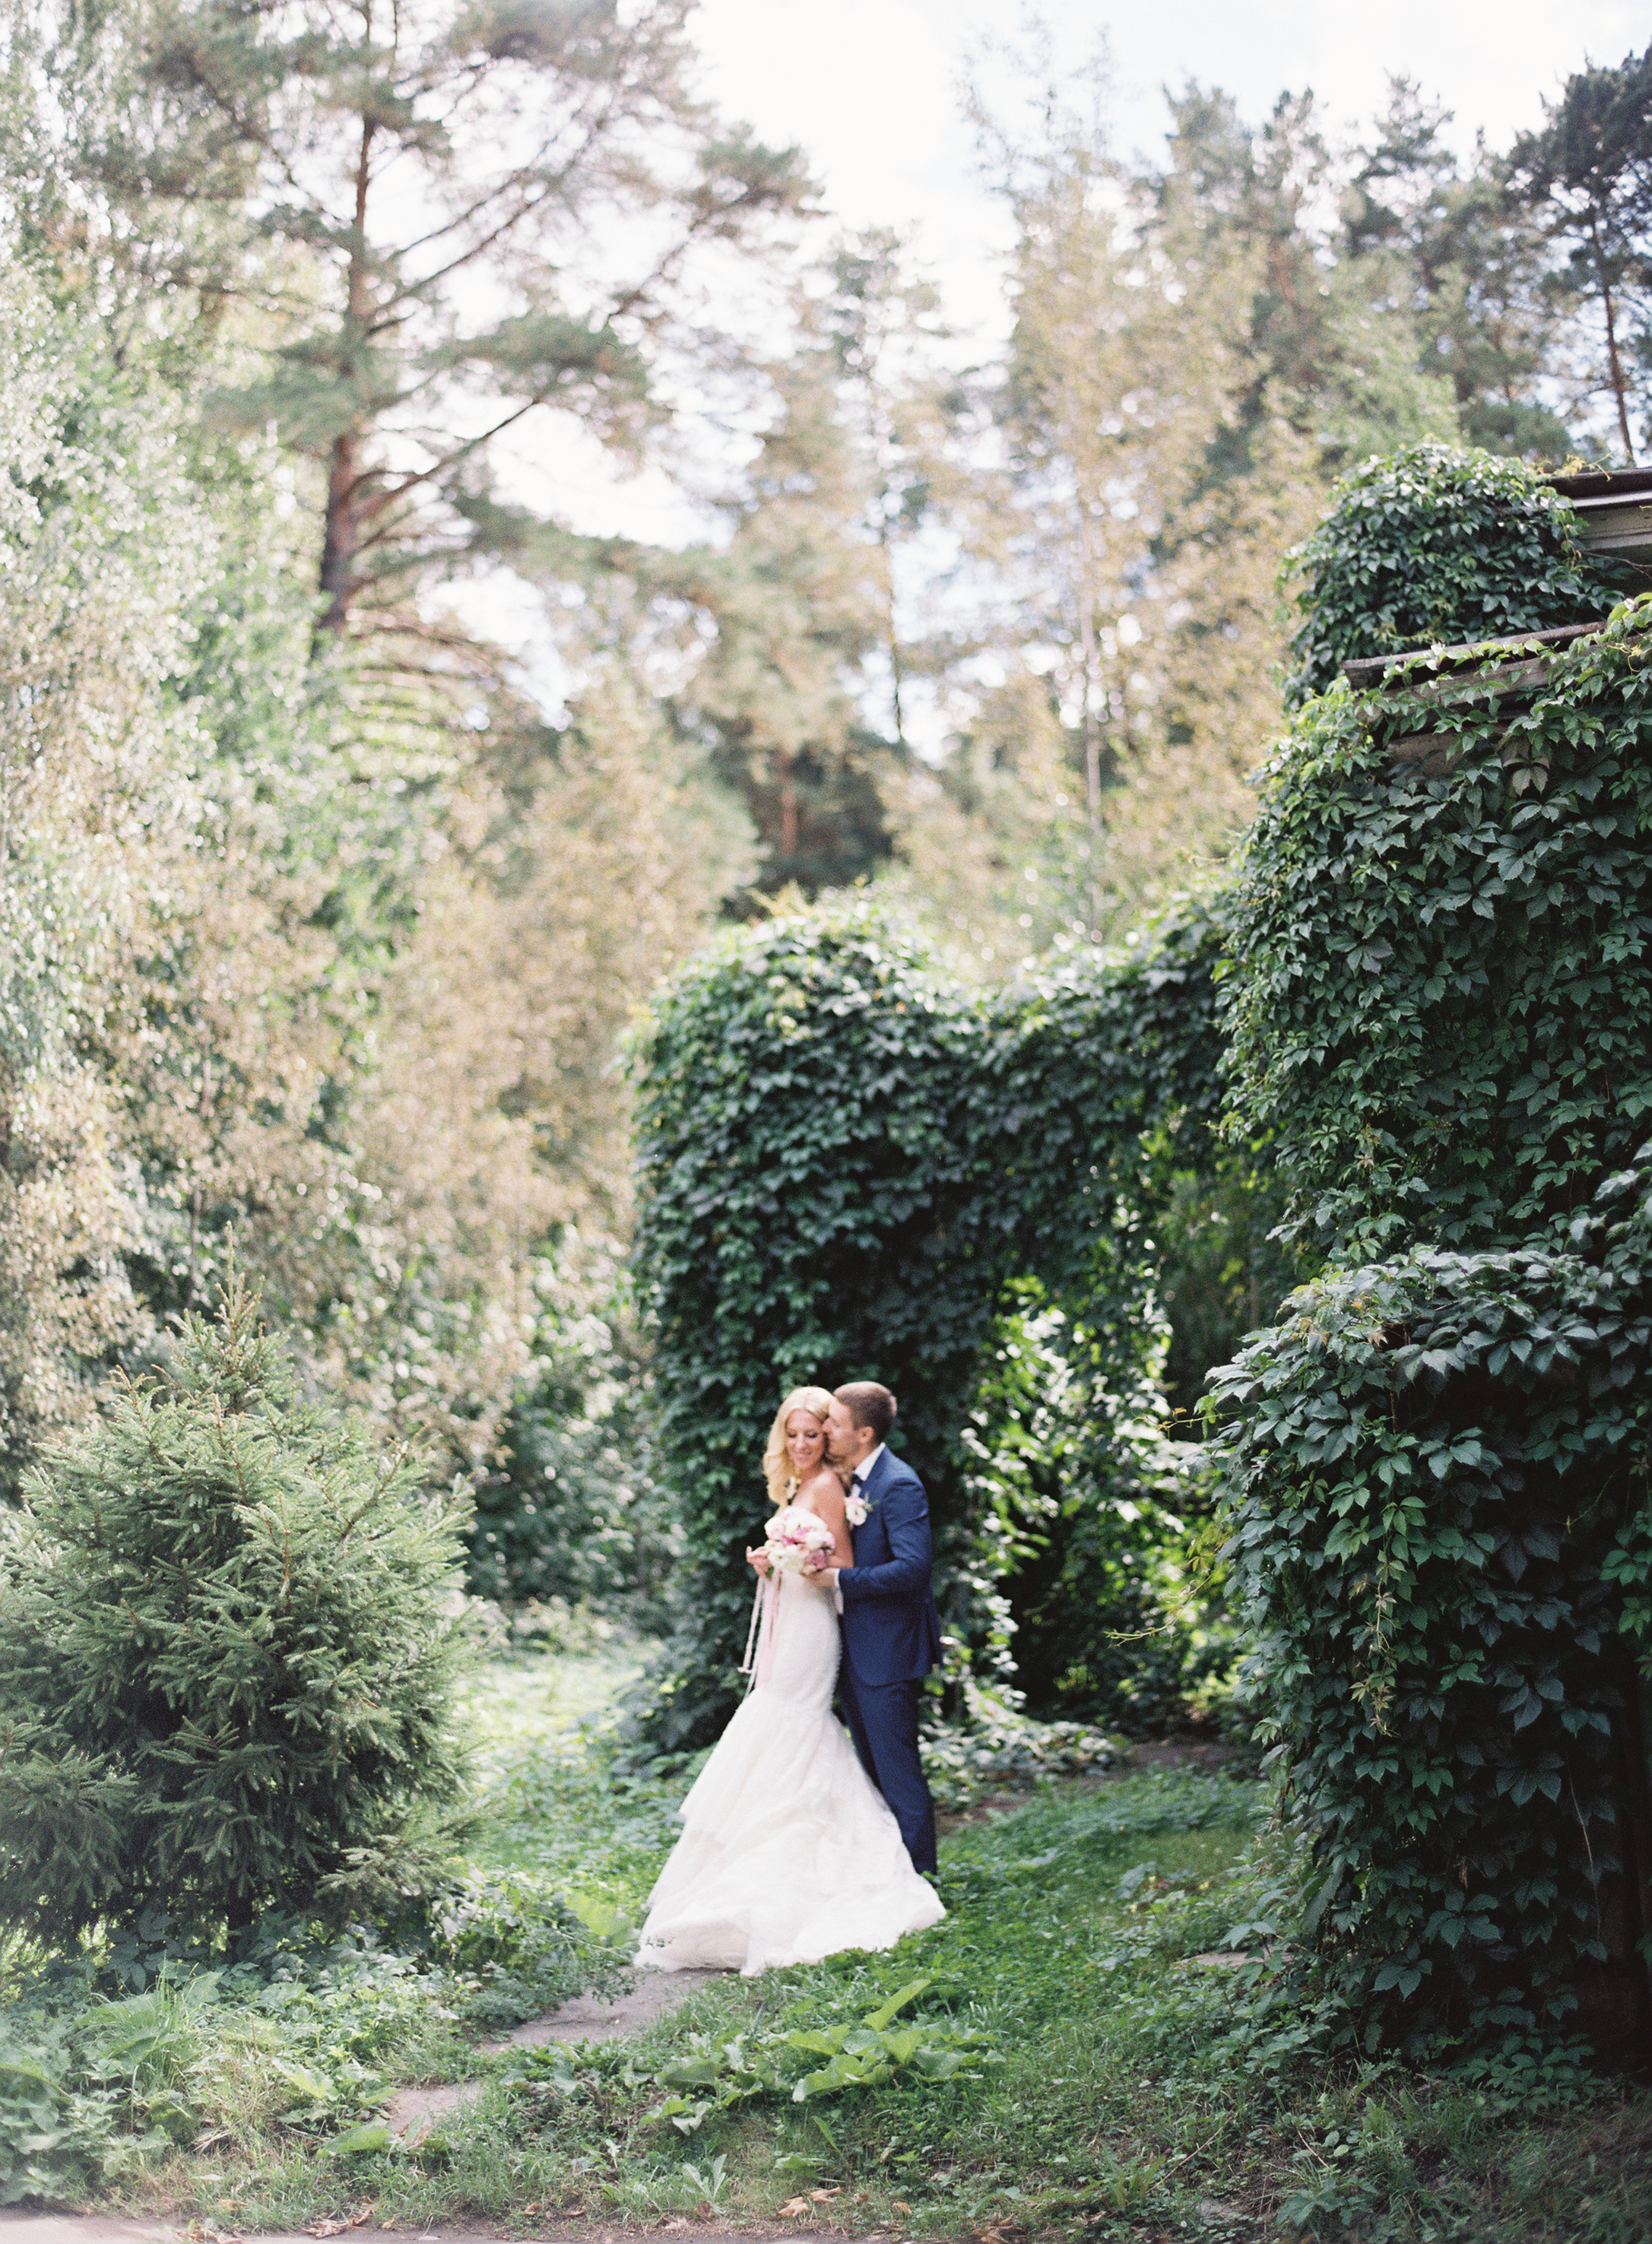 Wedding day-1-3.jpg